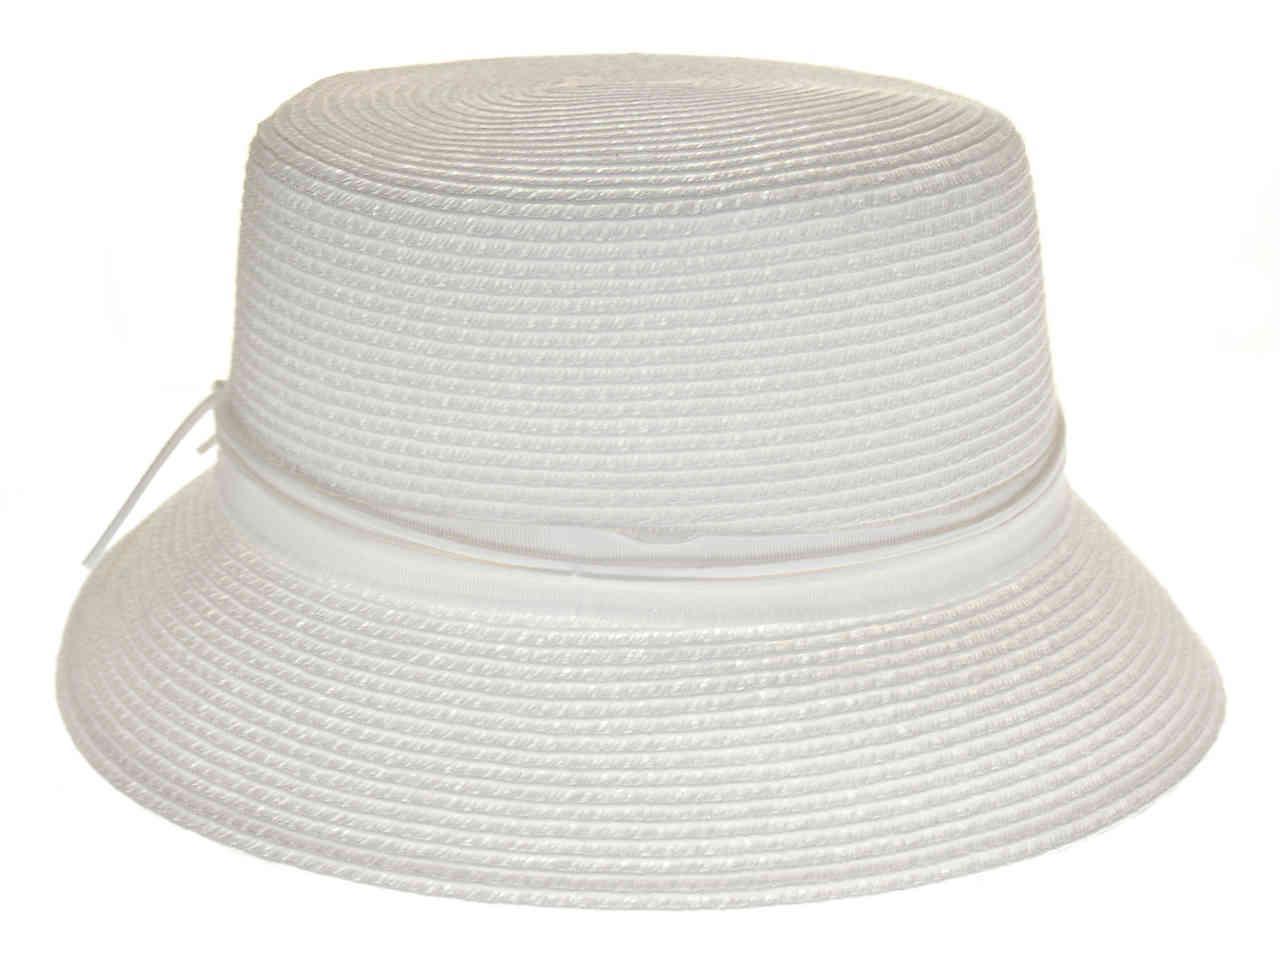 Lyst - Nine West Packable Bucket Hat in White 0b735374024